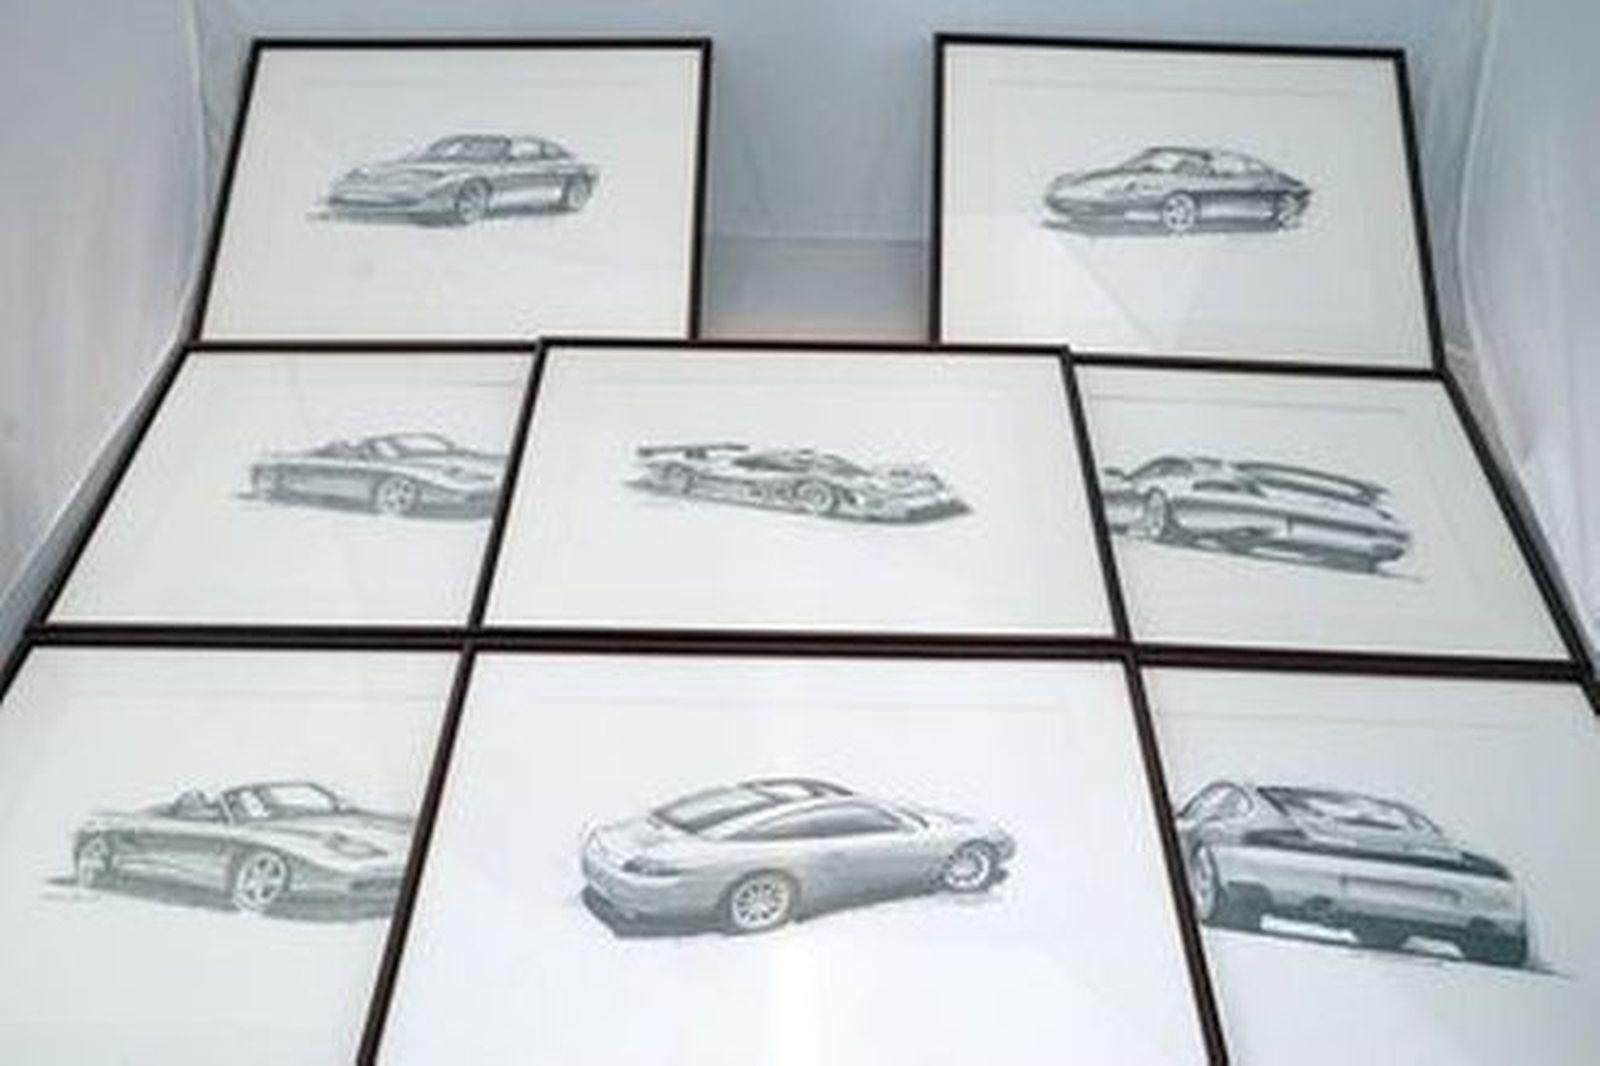 Framed Sketches x 8 -  Fredd Briggs Porsche Framed Sketches (51 x 41cm)